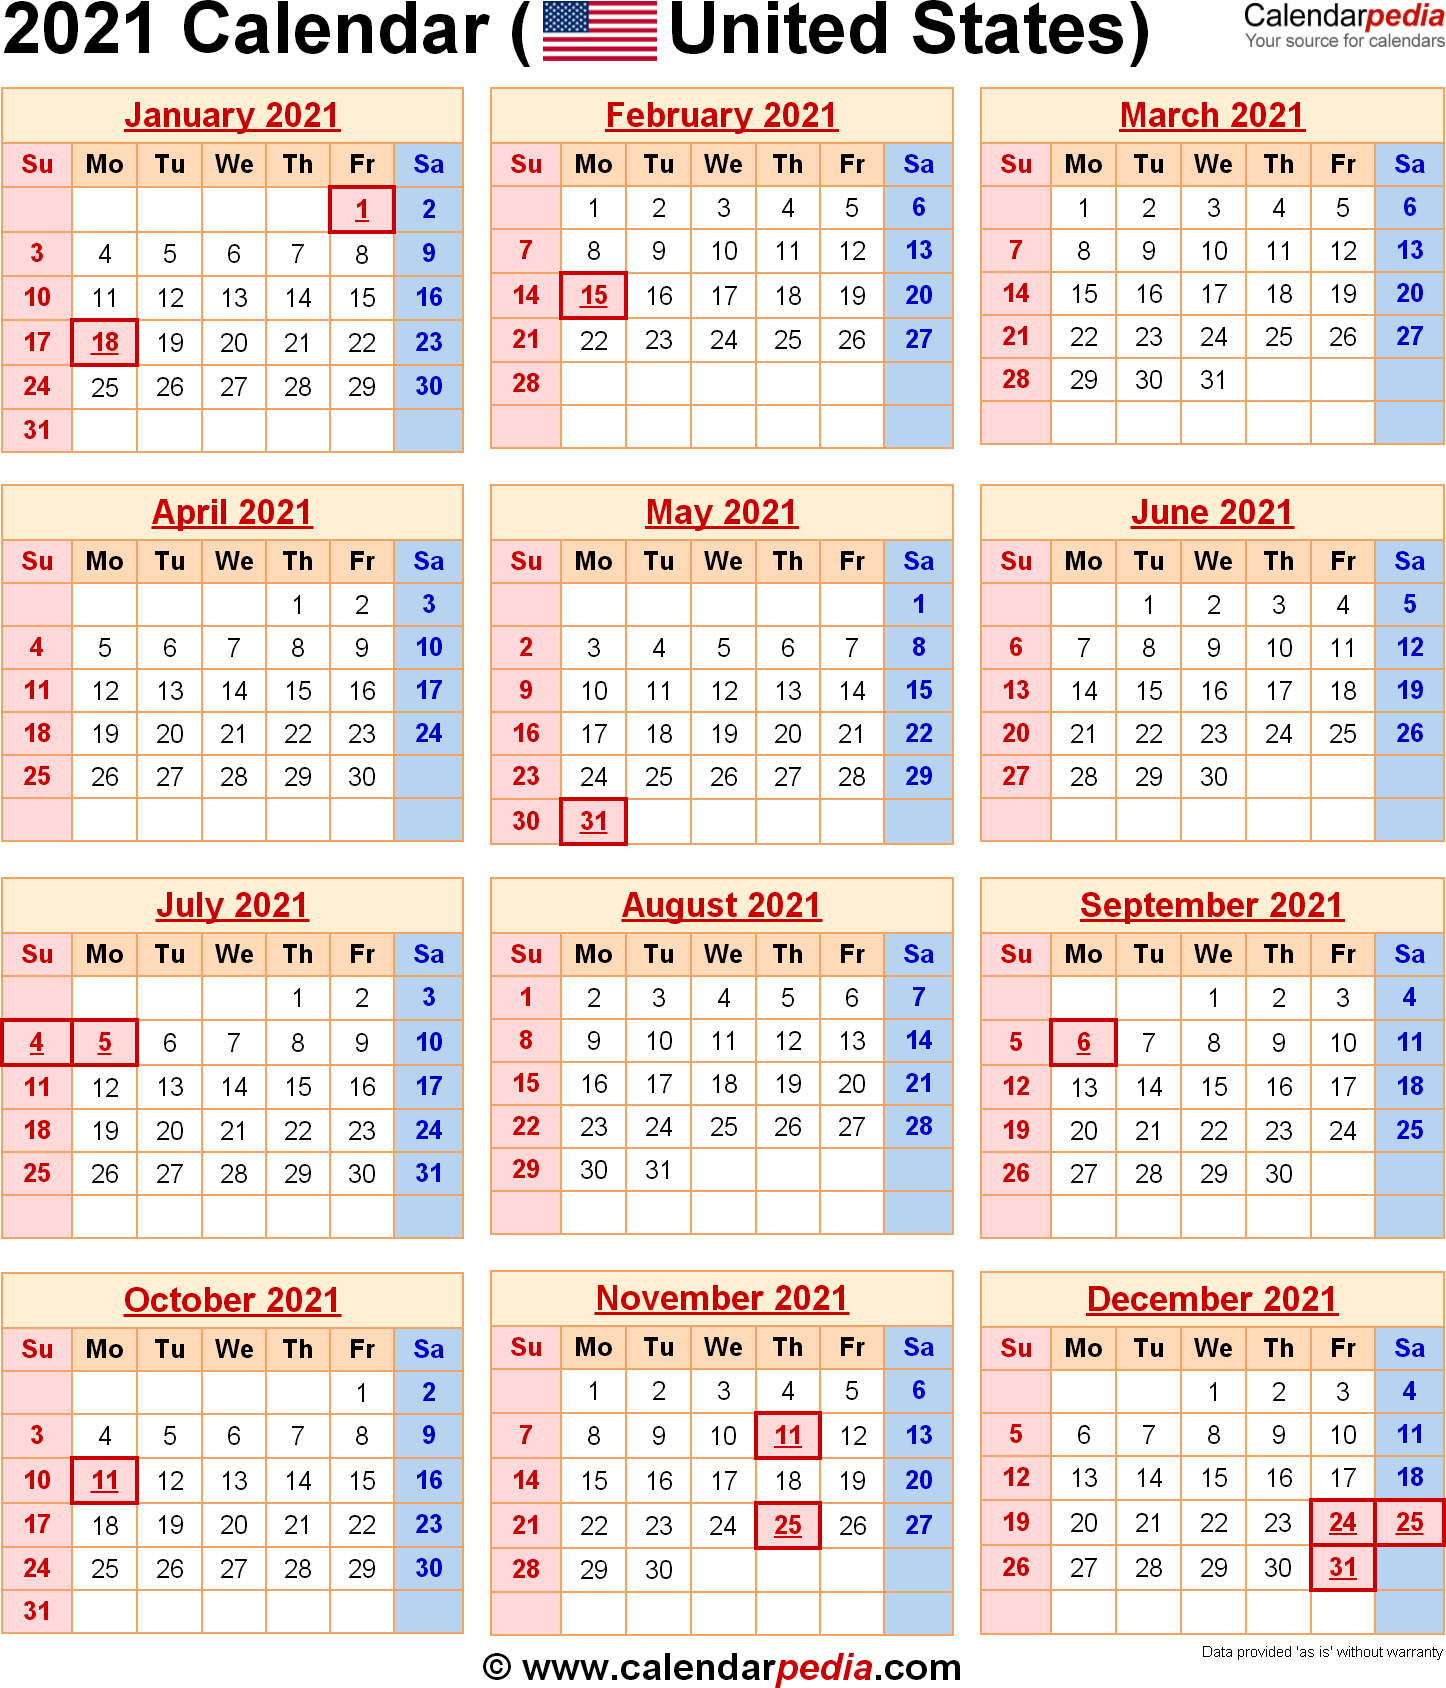 2021 Calendar With Federal Holidays throughout Federal Government Calendar 2021 Printable